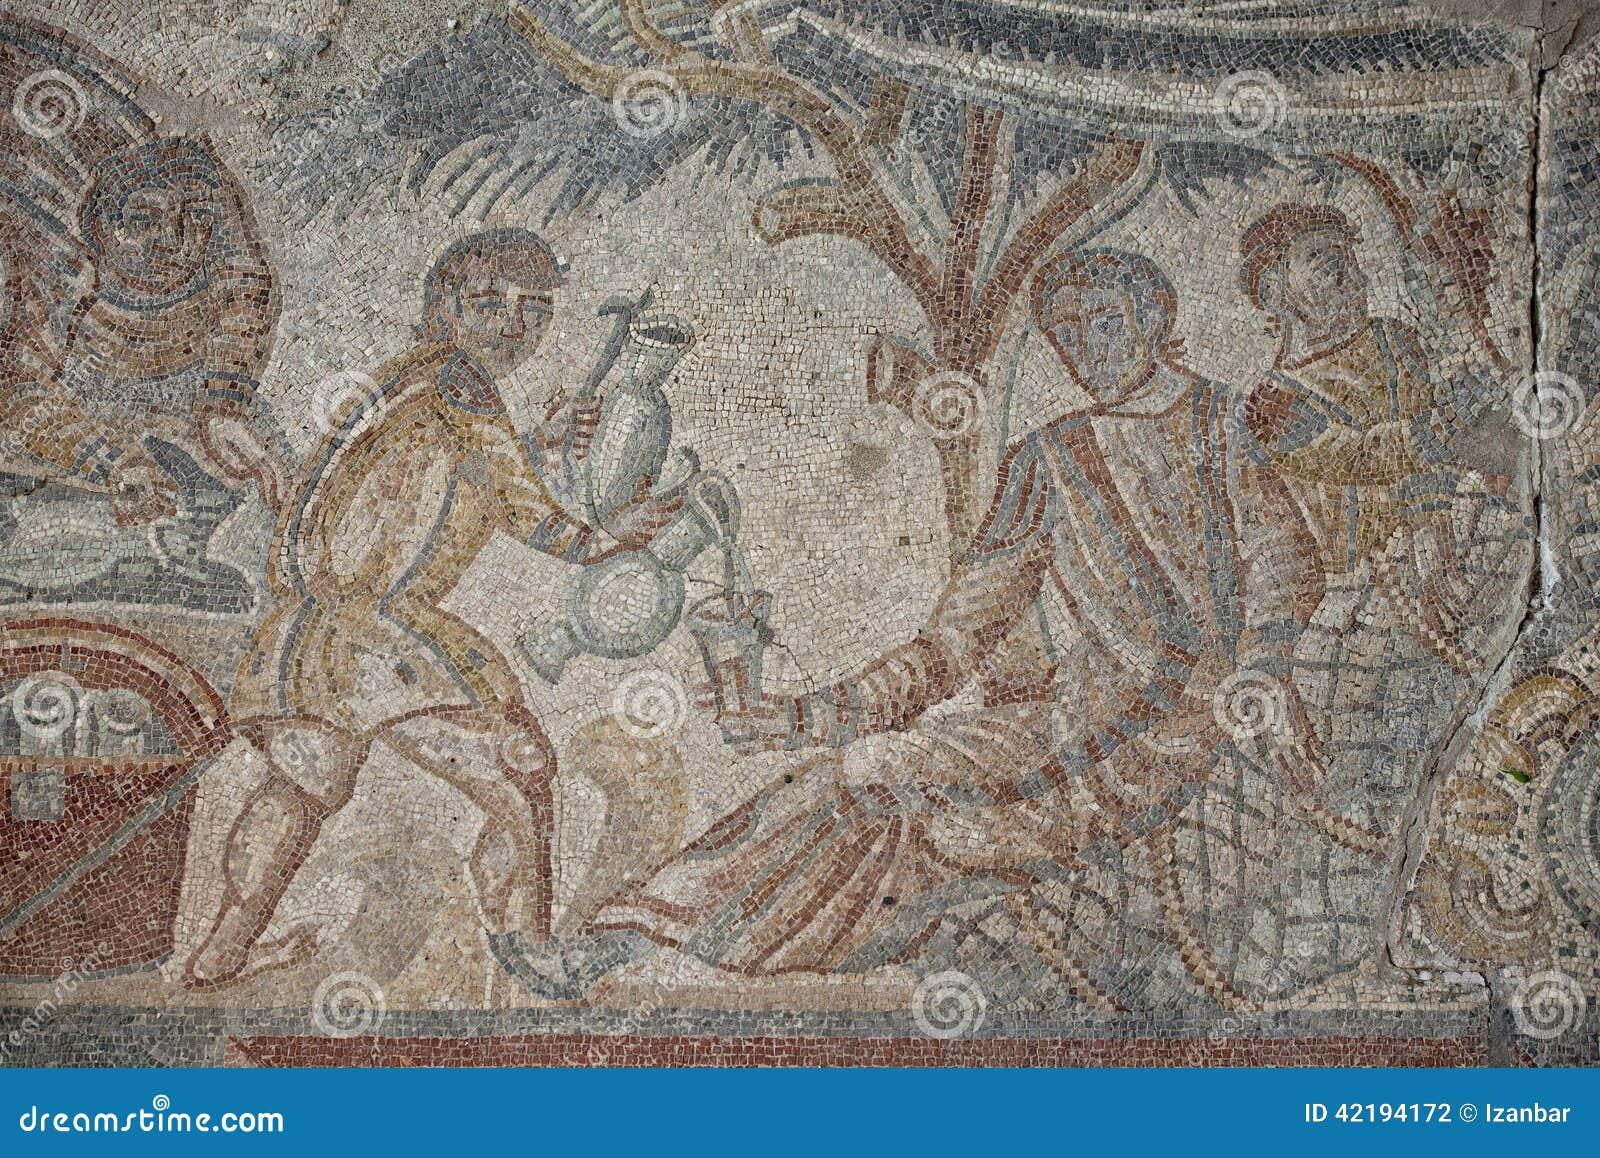 Roman Floor Mosaic Stock Photo Image 42194172